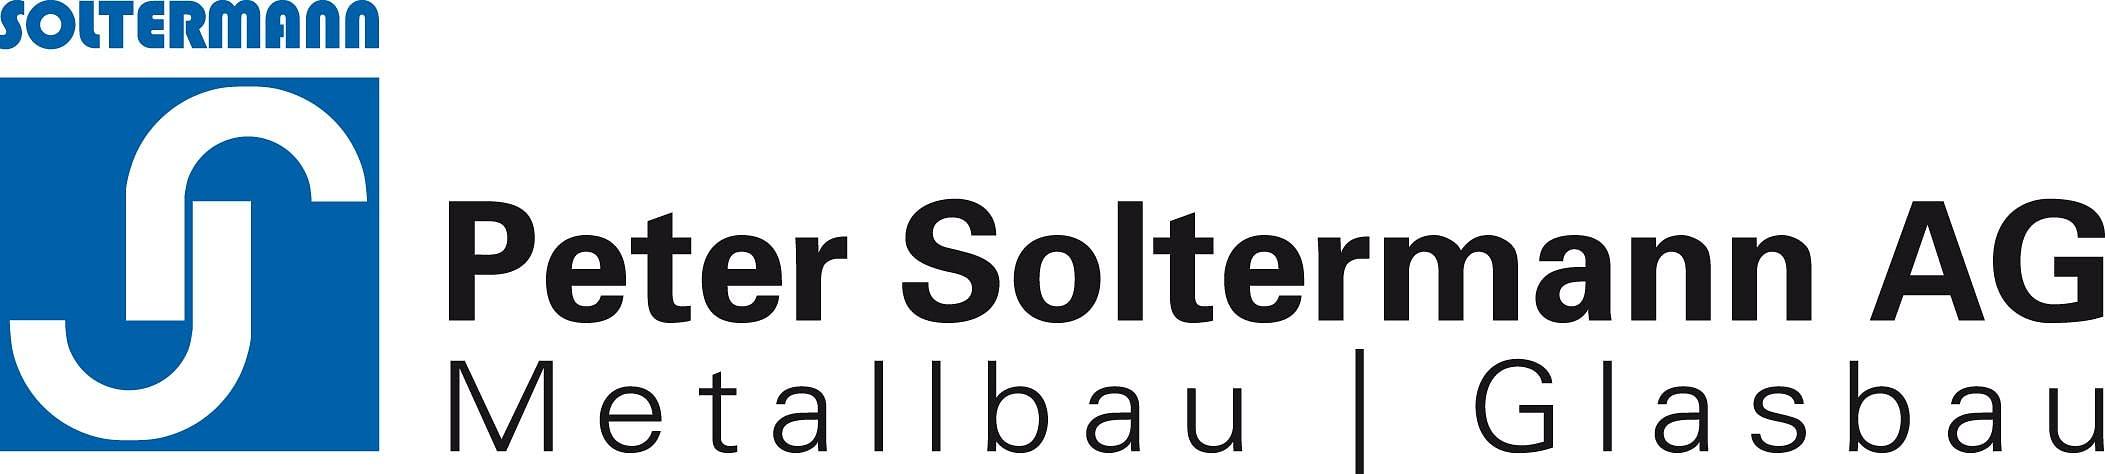 Soltermann Peter AG